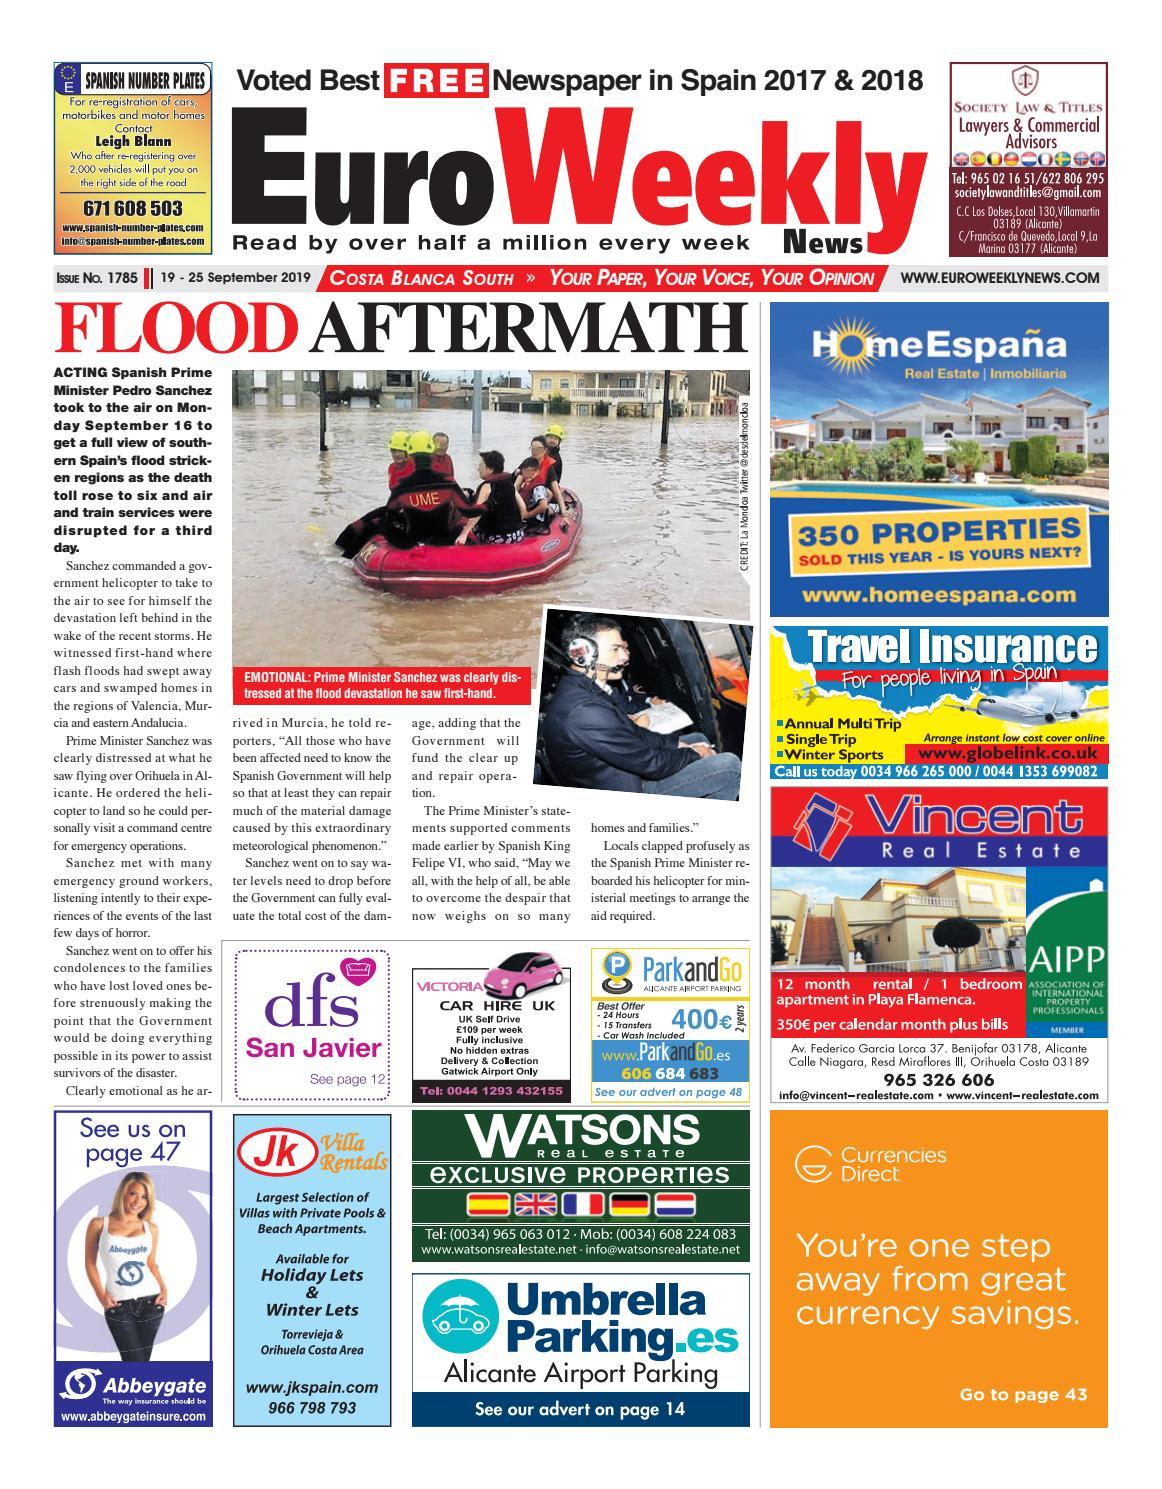 Euro Weekly News - Costa Blanca South 19 - 25 September 2019